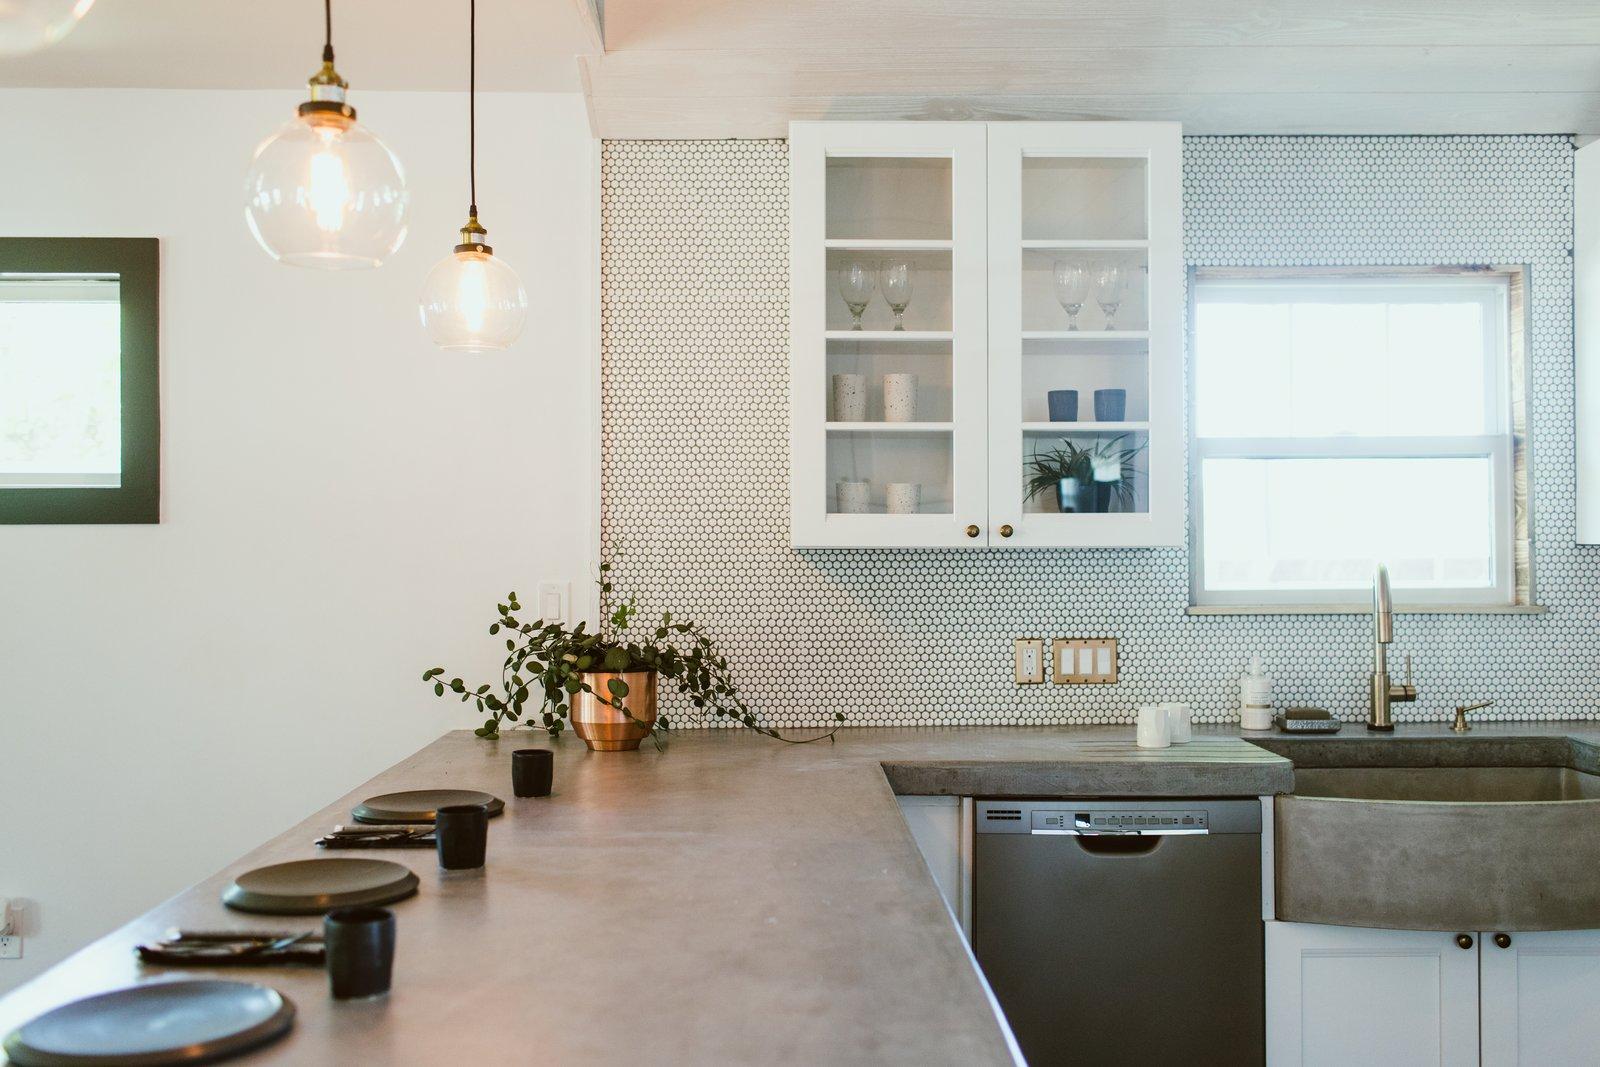 Tagged: Concrete Counter, White Cabinet, and Ceramic Tile Backsplashe.  Gullett House by Jeanne Schultz Design Studio